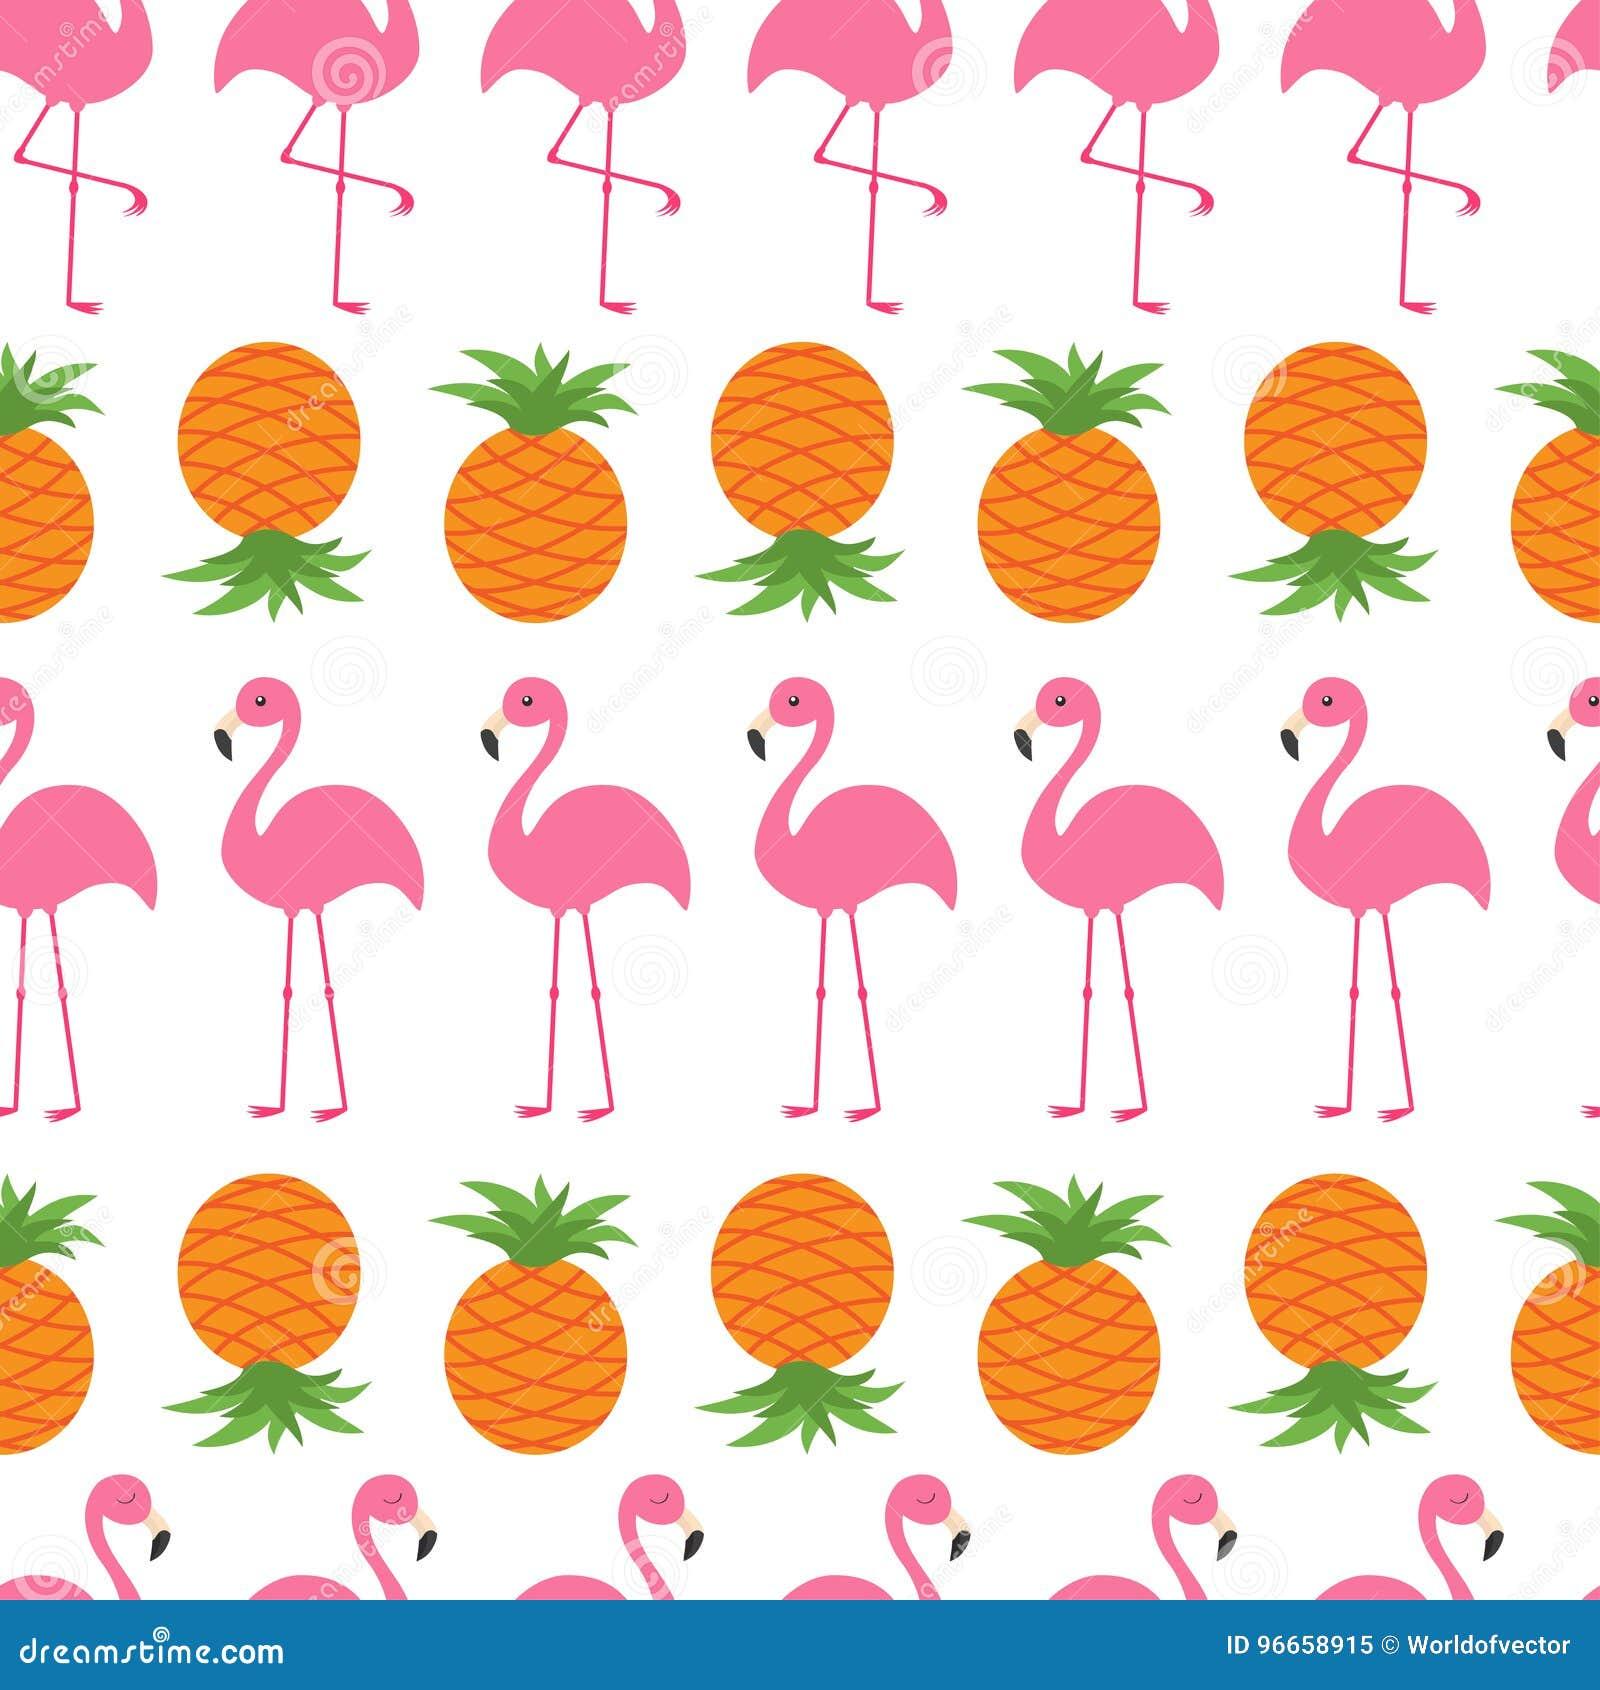 pineapple pink flamingo set seamless pattern wrapping paper